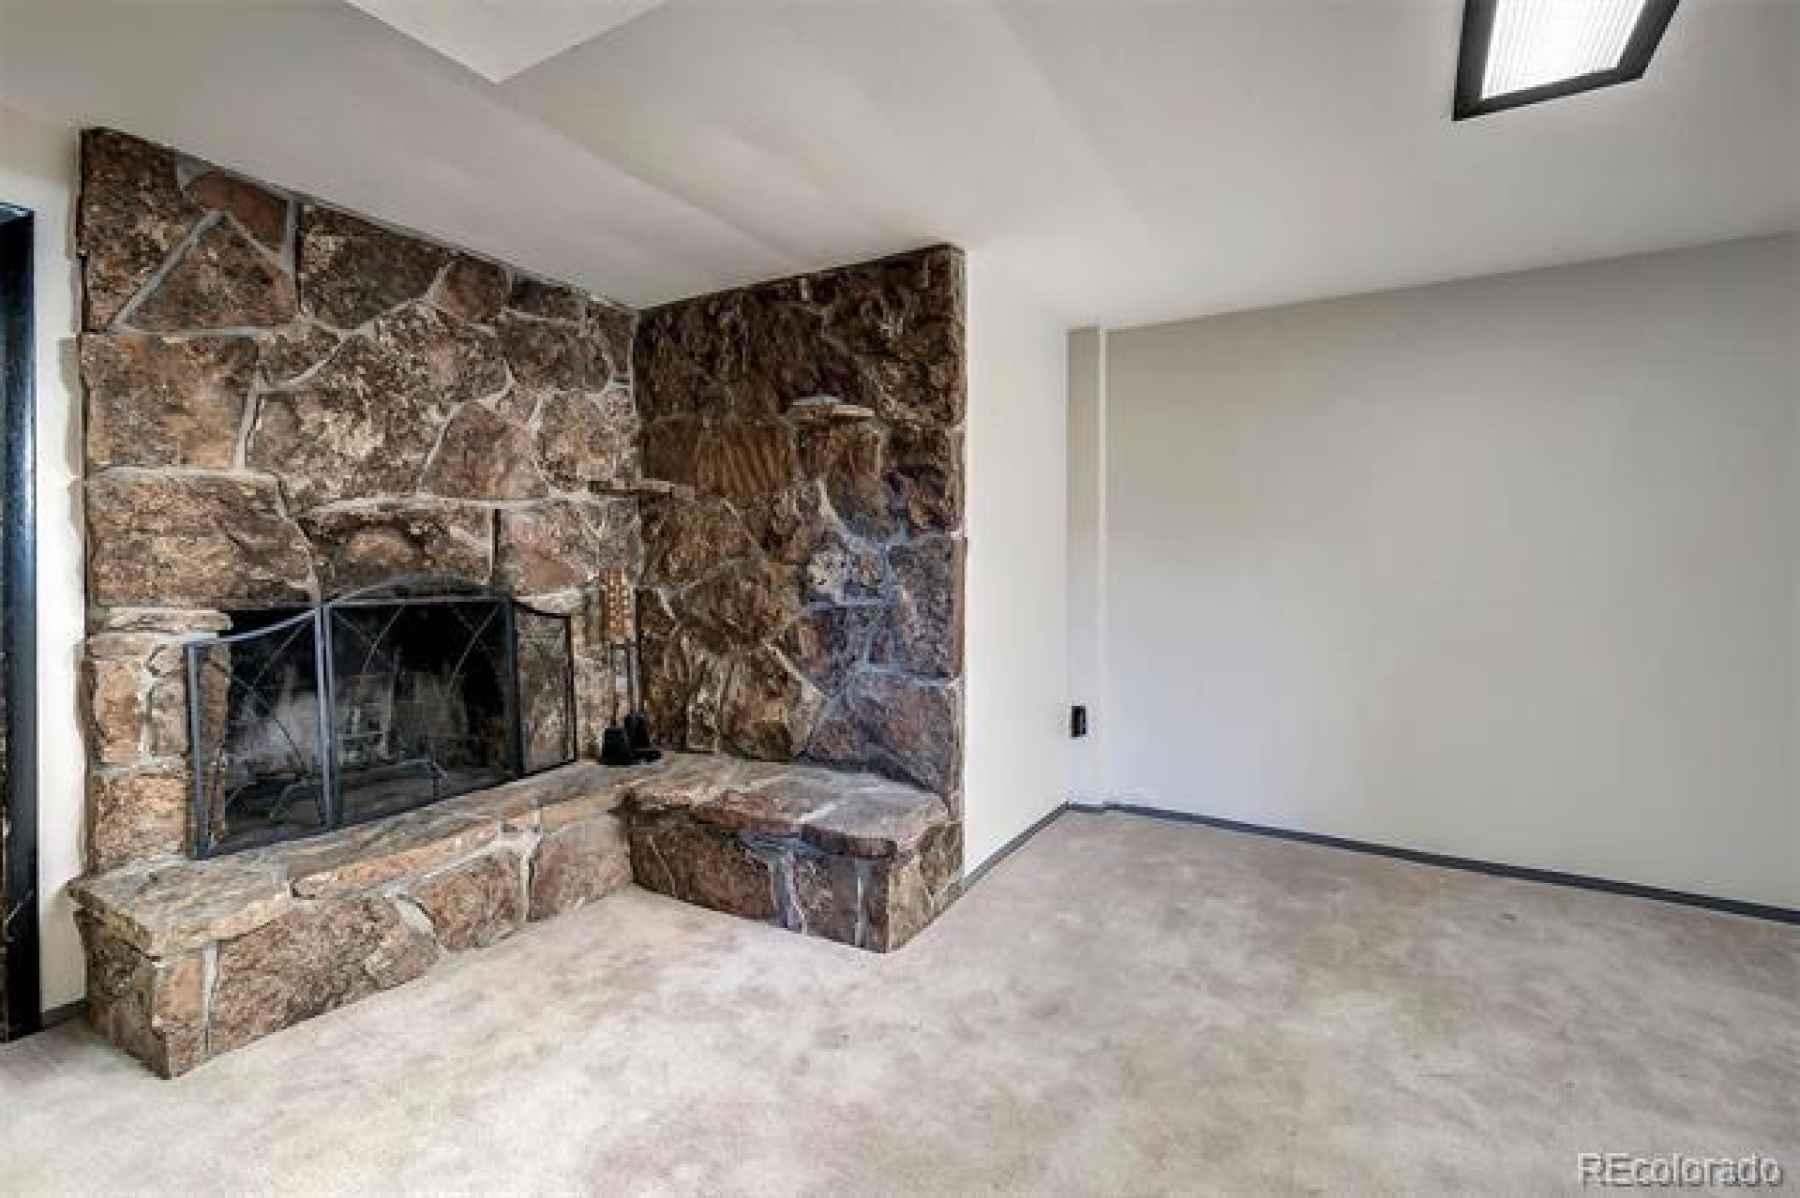 basement fireplace is operational